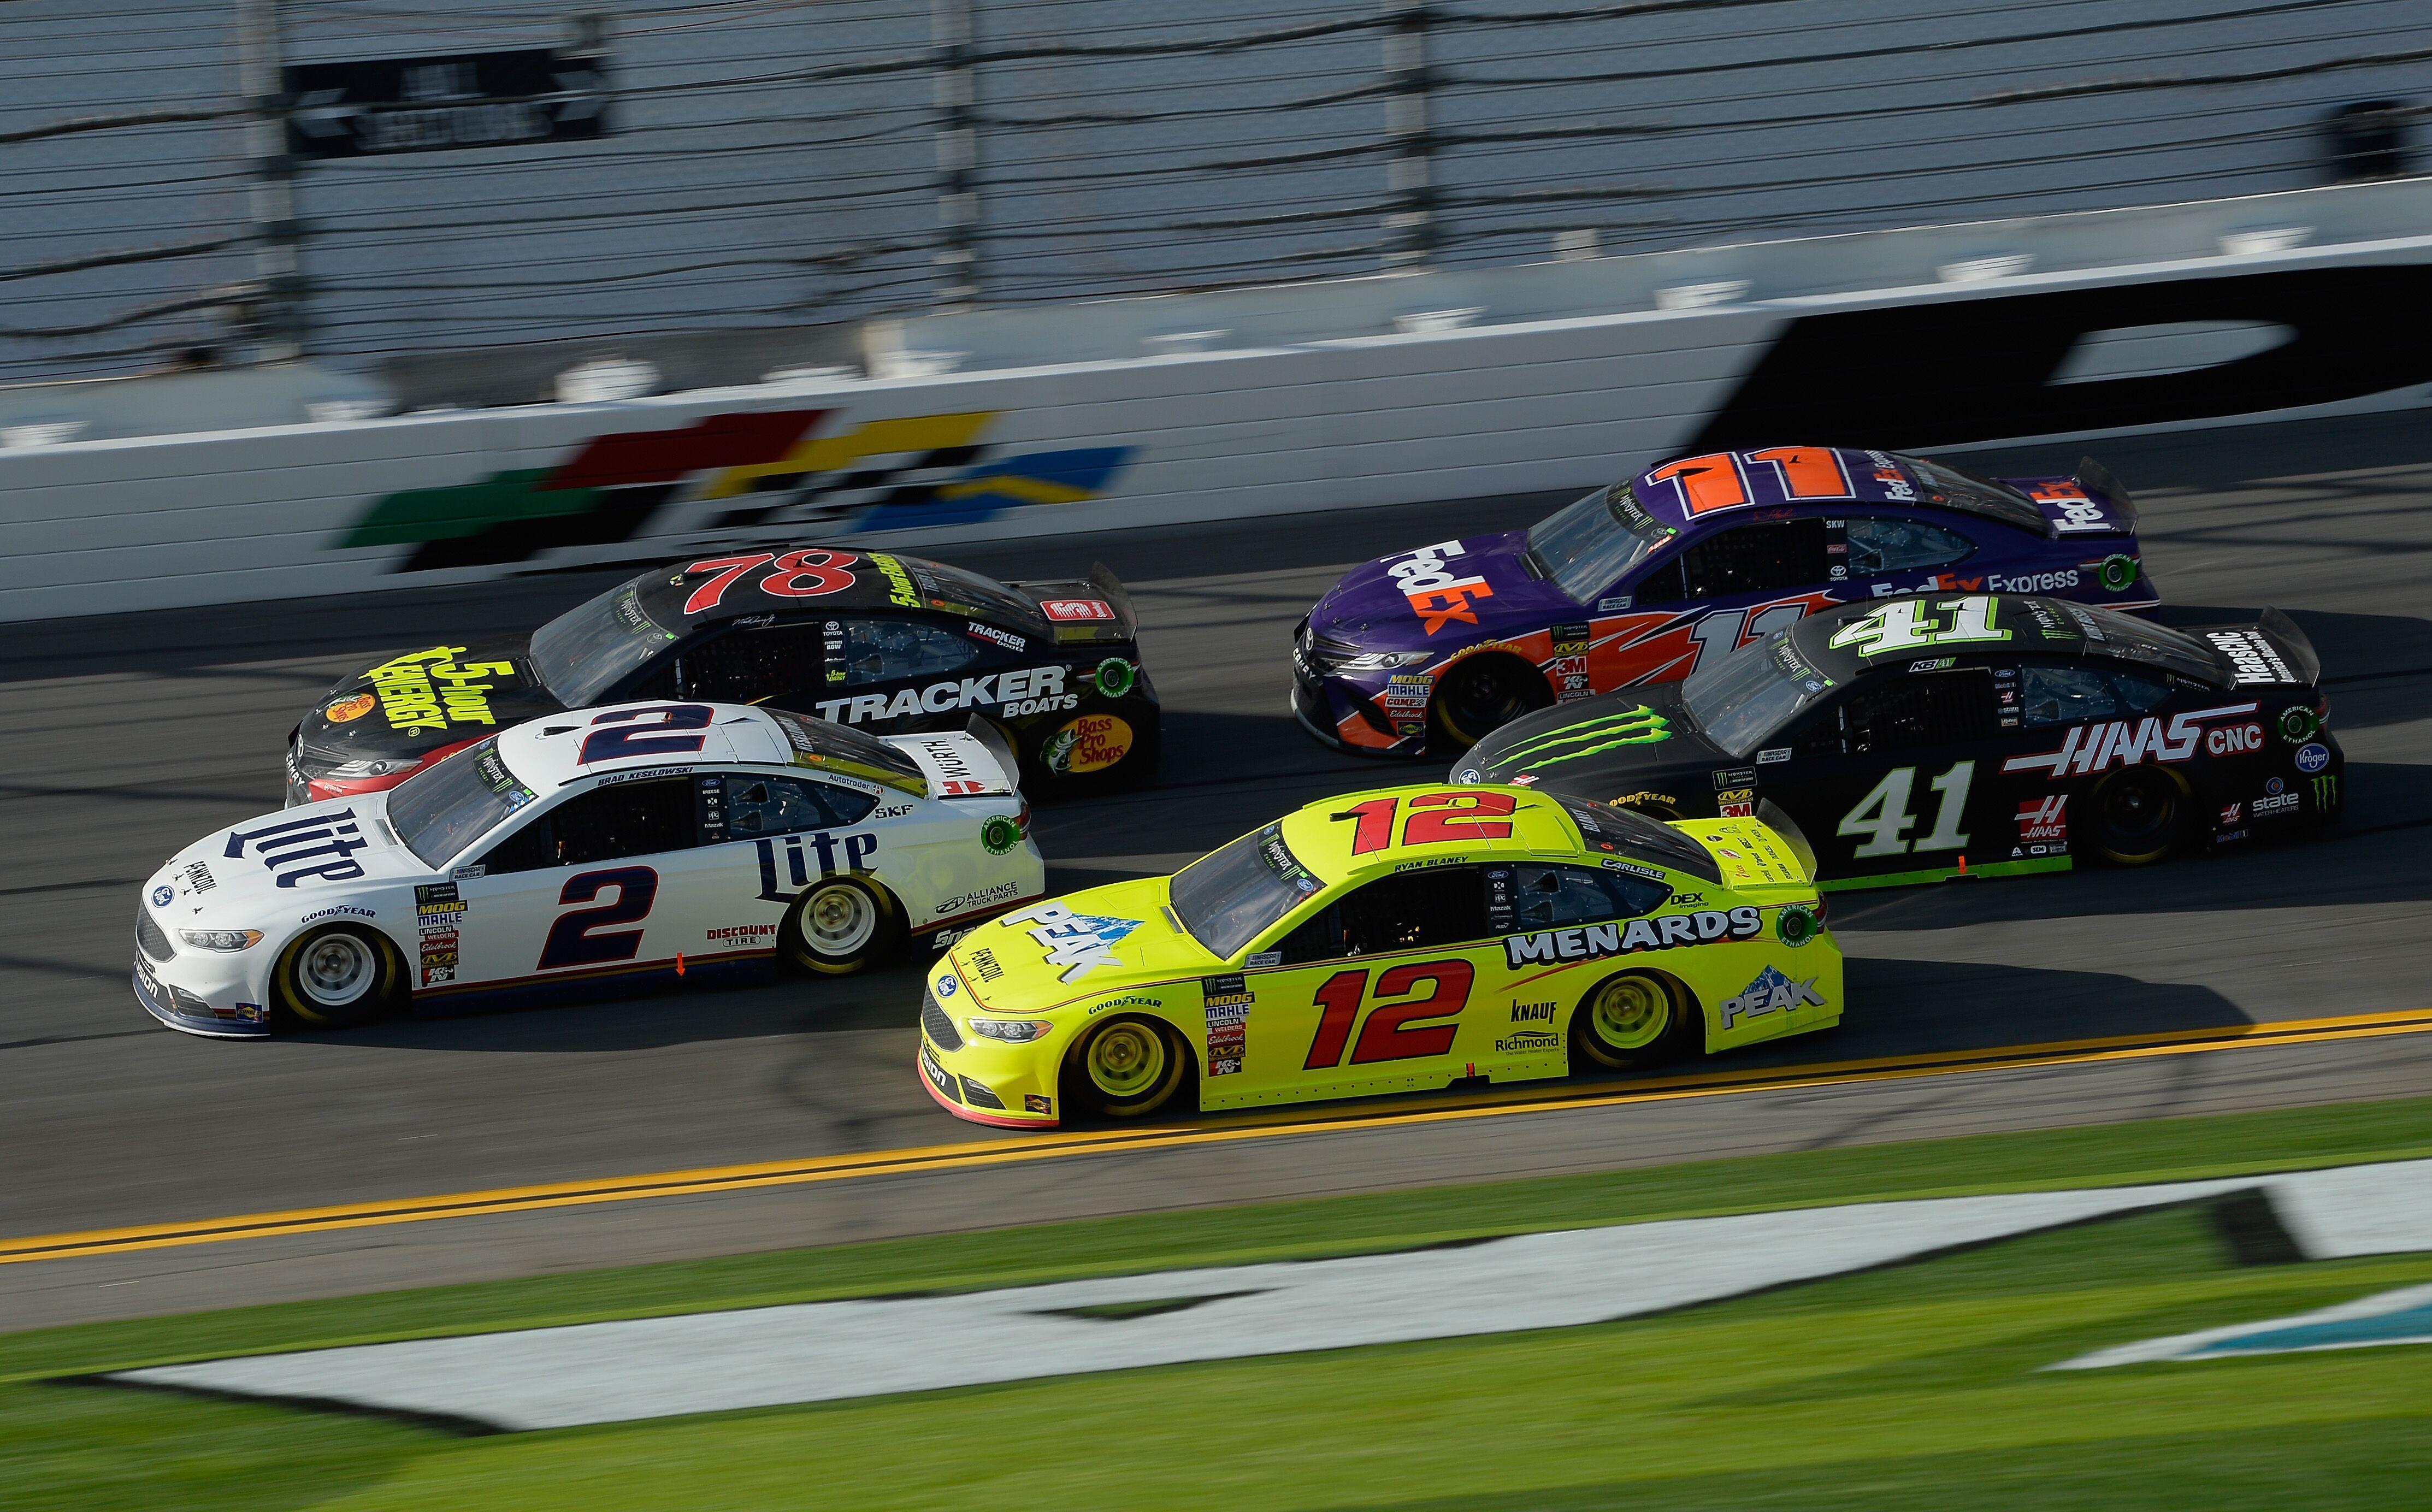 NASCAR: 5 drivers most likely to win the 2018 Daytona 500